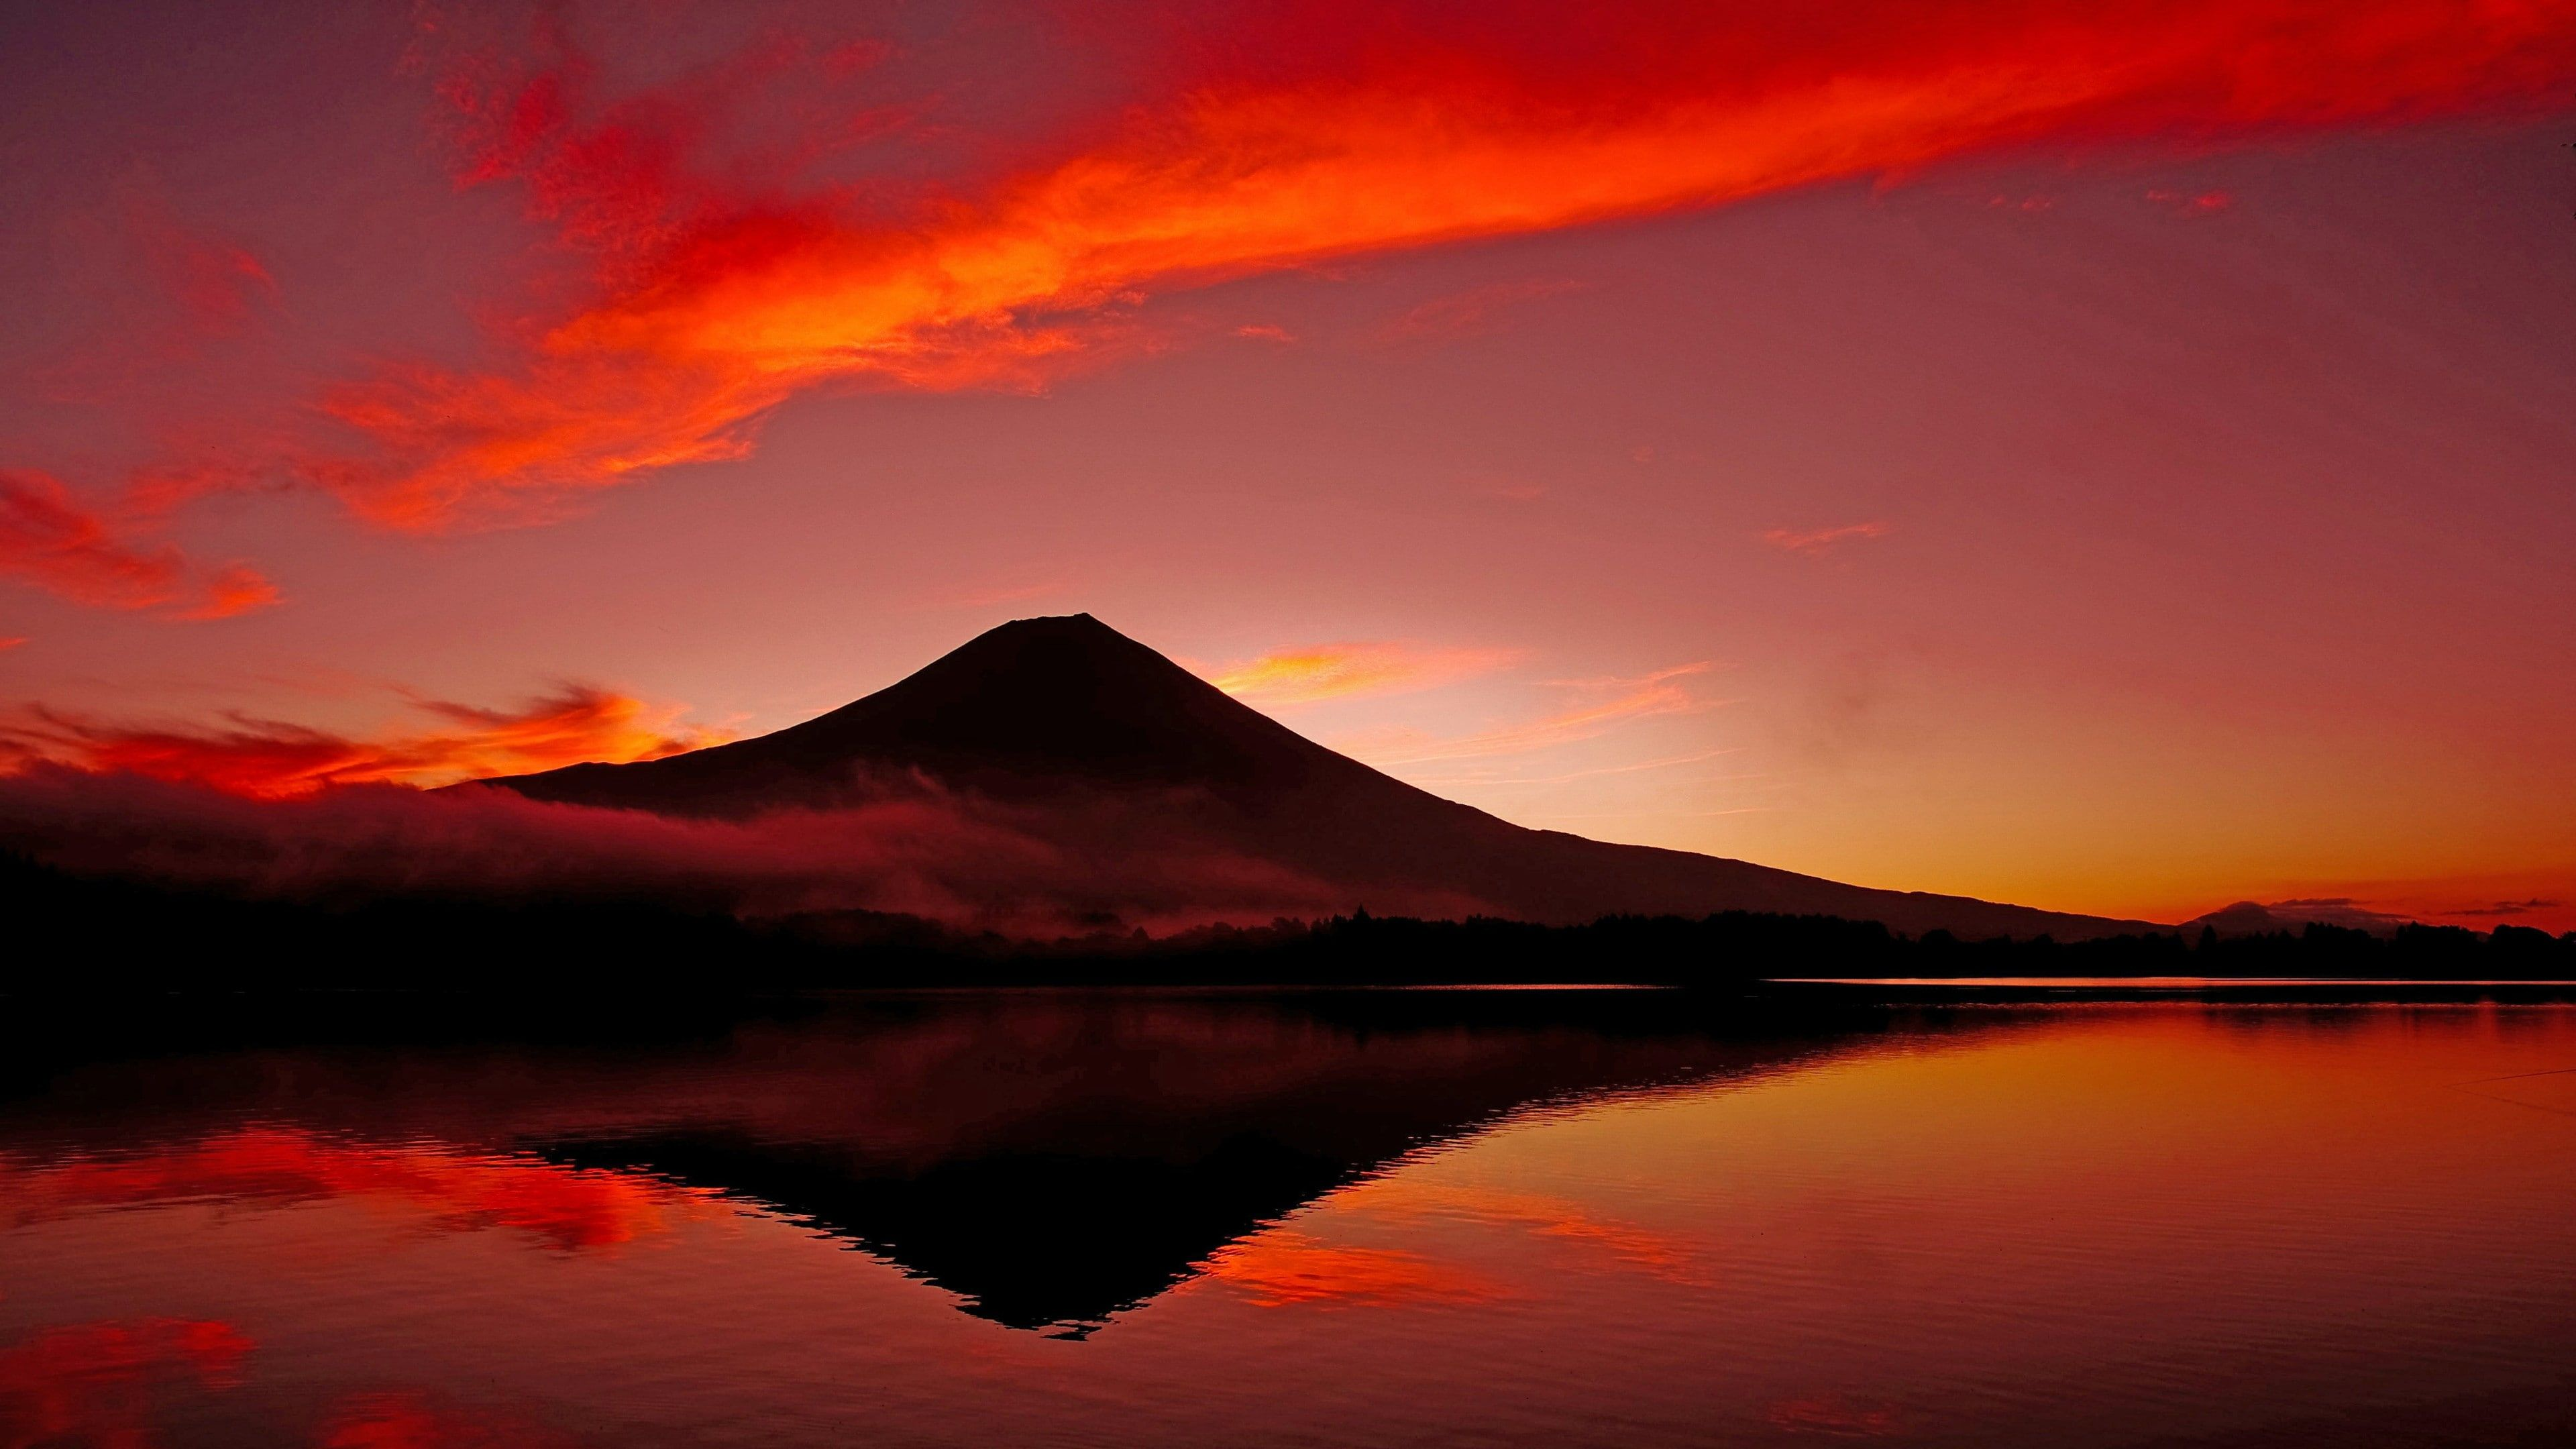 Loch Asia Lake Tanuki Fujinomiya Sizuoka Calm Fuji Dusk Mount Fuji Honshu Horizon Red Sky Sunset Lake Twilight Refle Mount Fuji Waterscape Red Sky Hd wallpaper sunset sky red bridge